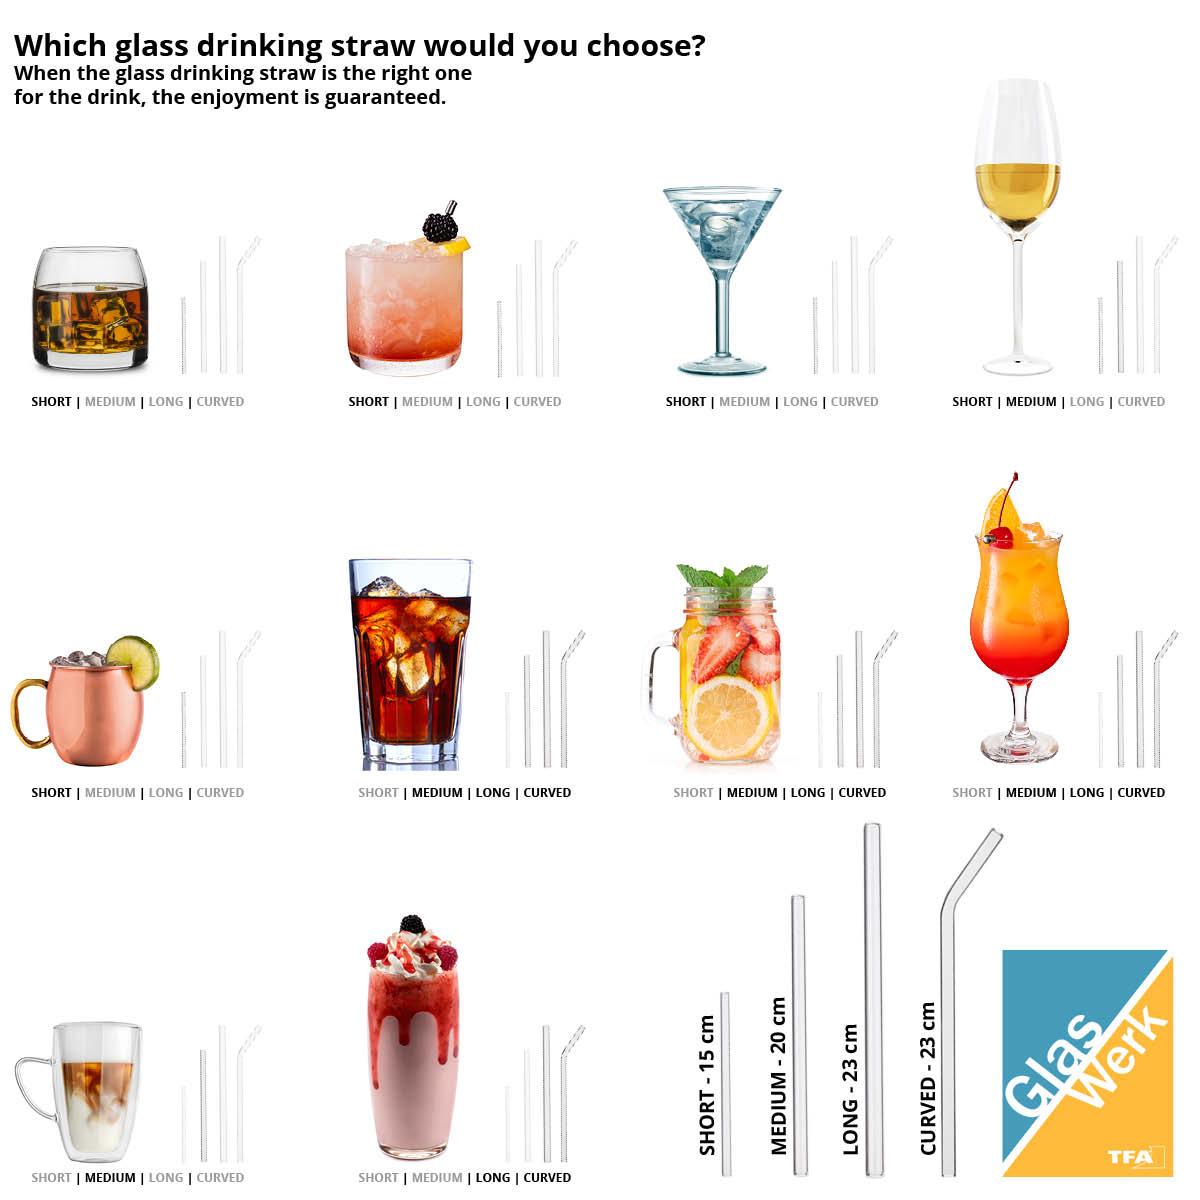 Glass straws from GlasWerk for many drinks.